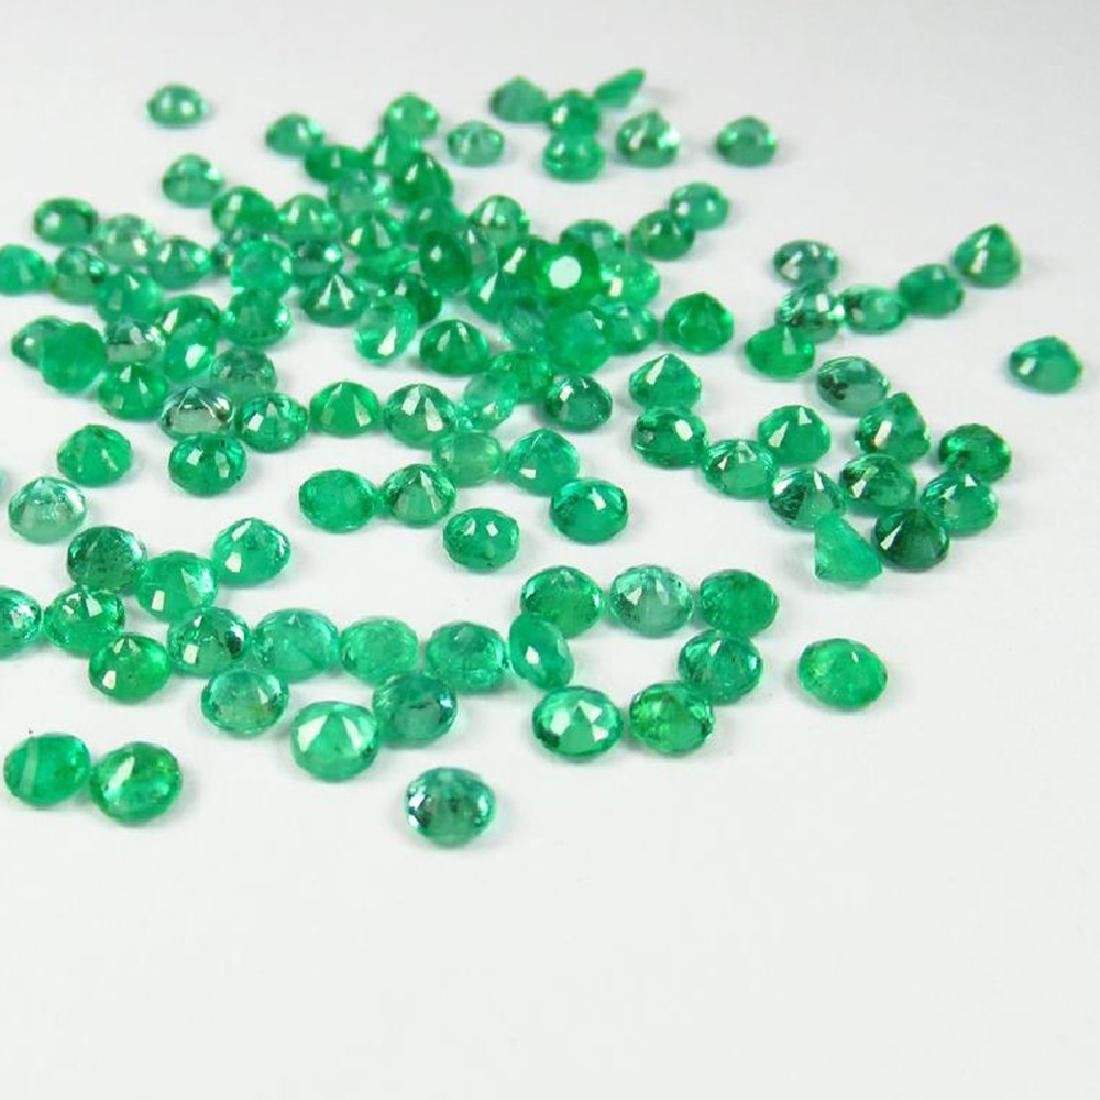 9.67 Ctw Natural 110 Calibrate Emerald 3.0 mm Round - 2